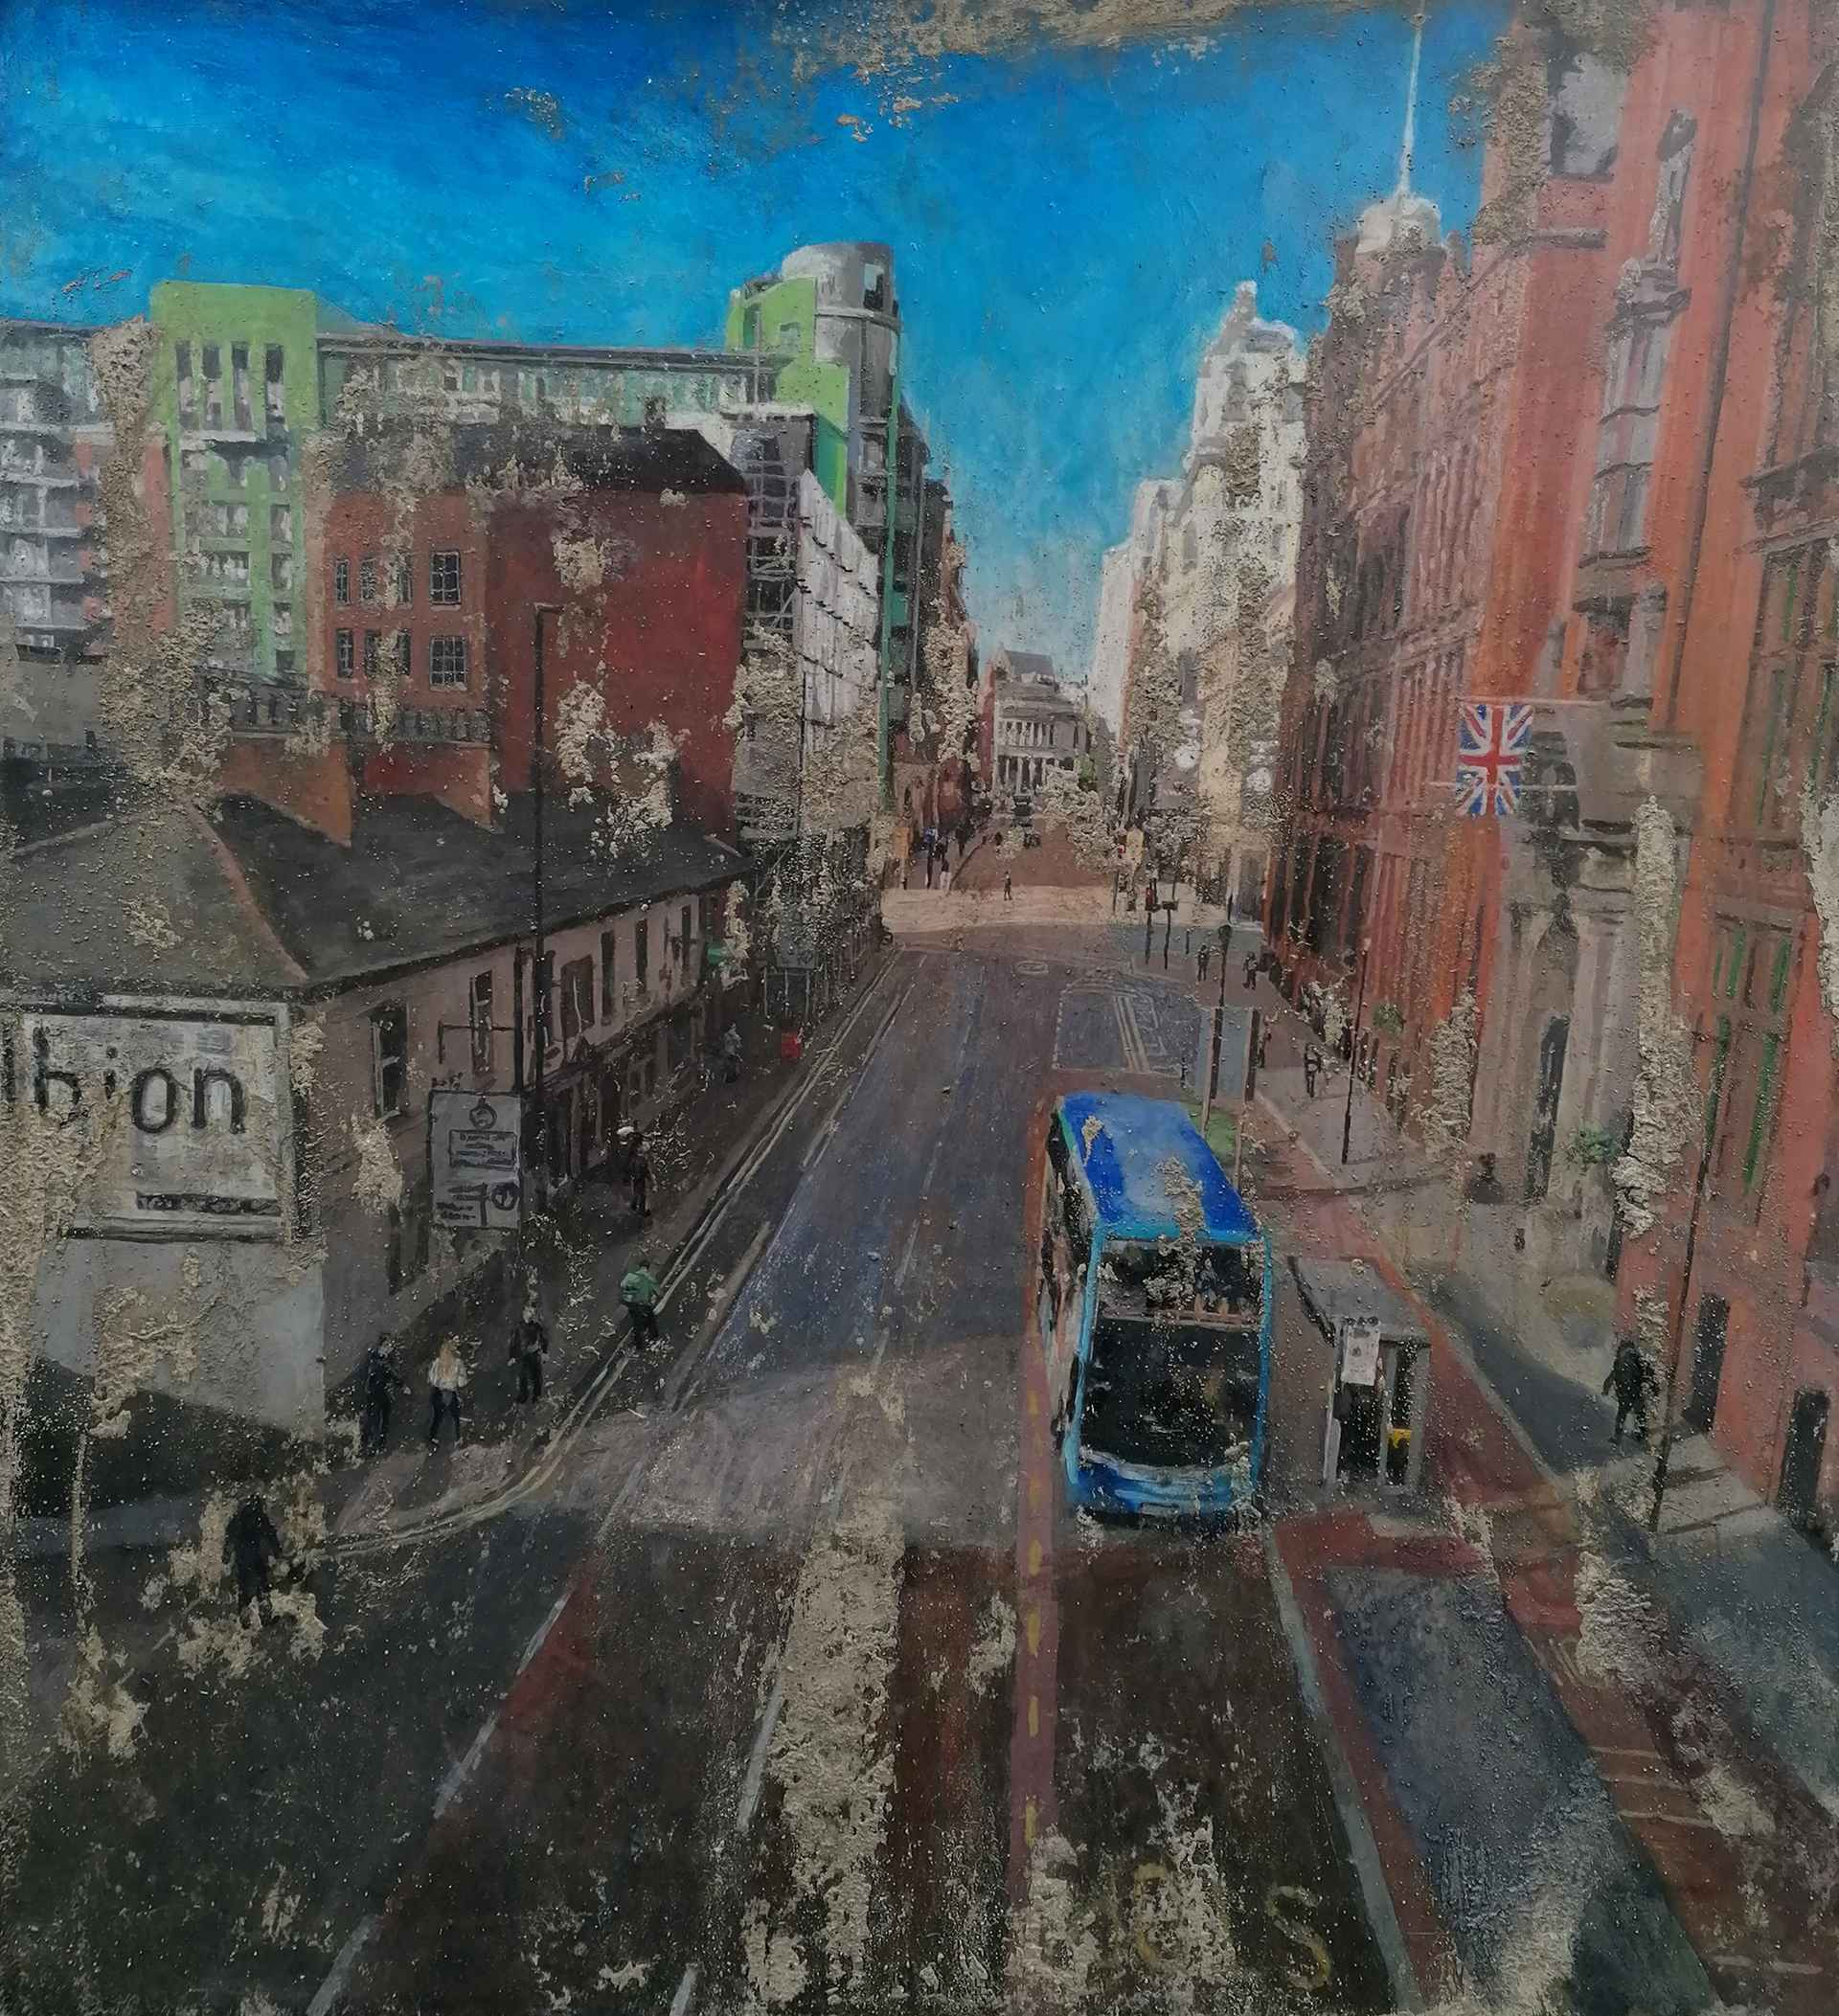 Oxford Road by Tim Garner